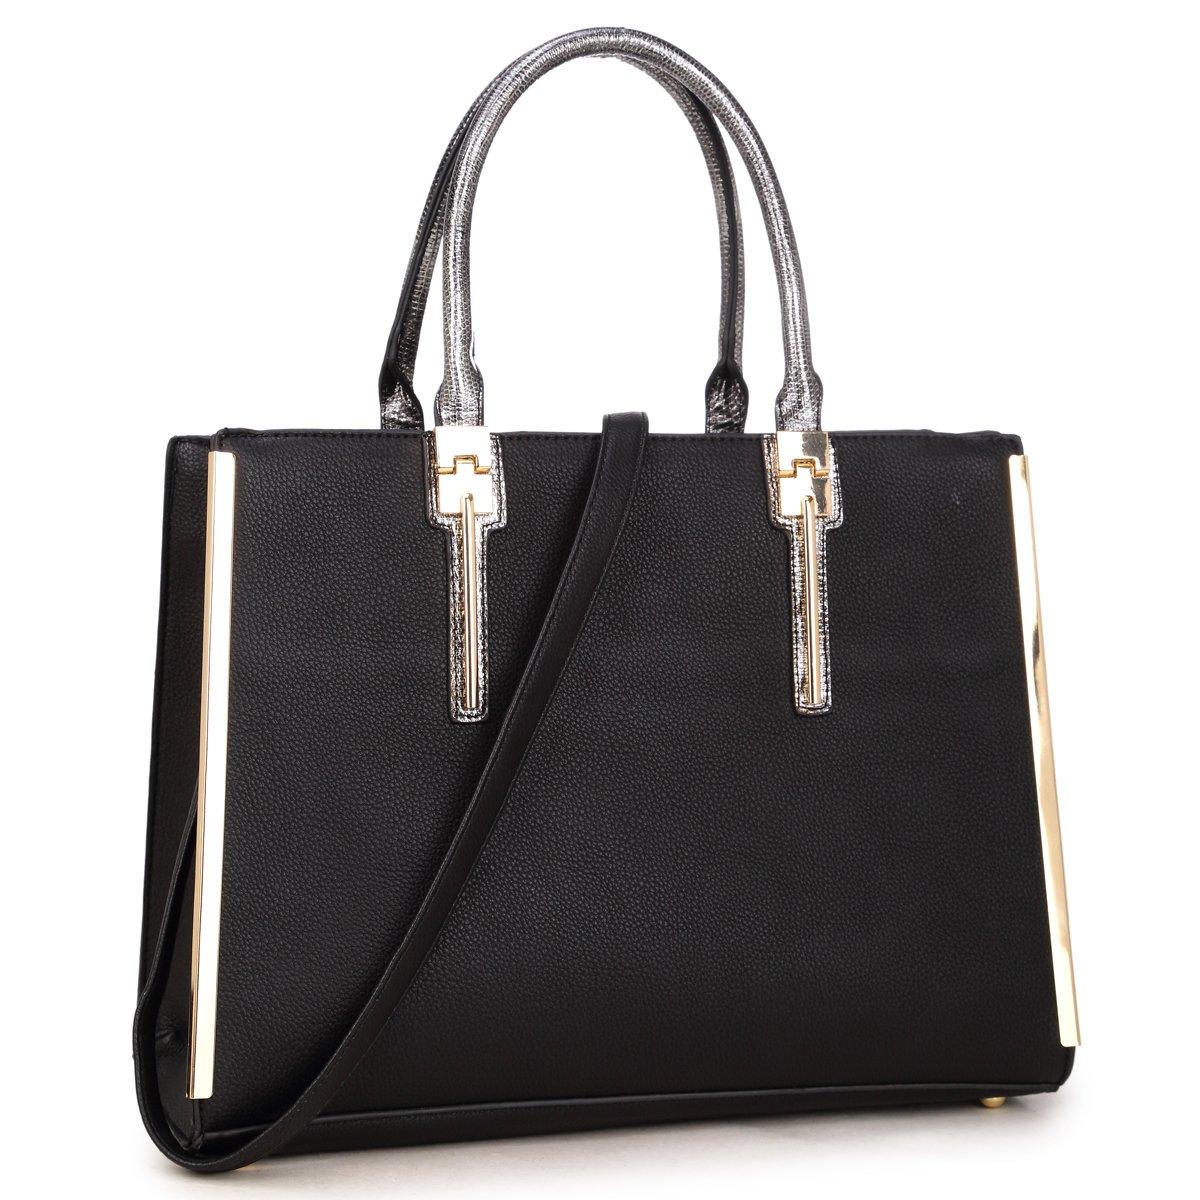 New Women Handbag Faux Leather Satchel Bags Medium Purse Briefcase (Black)